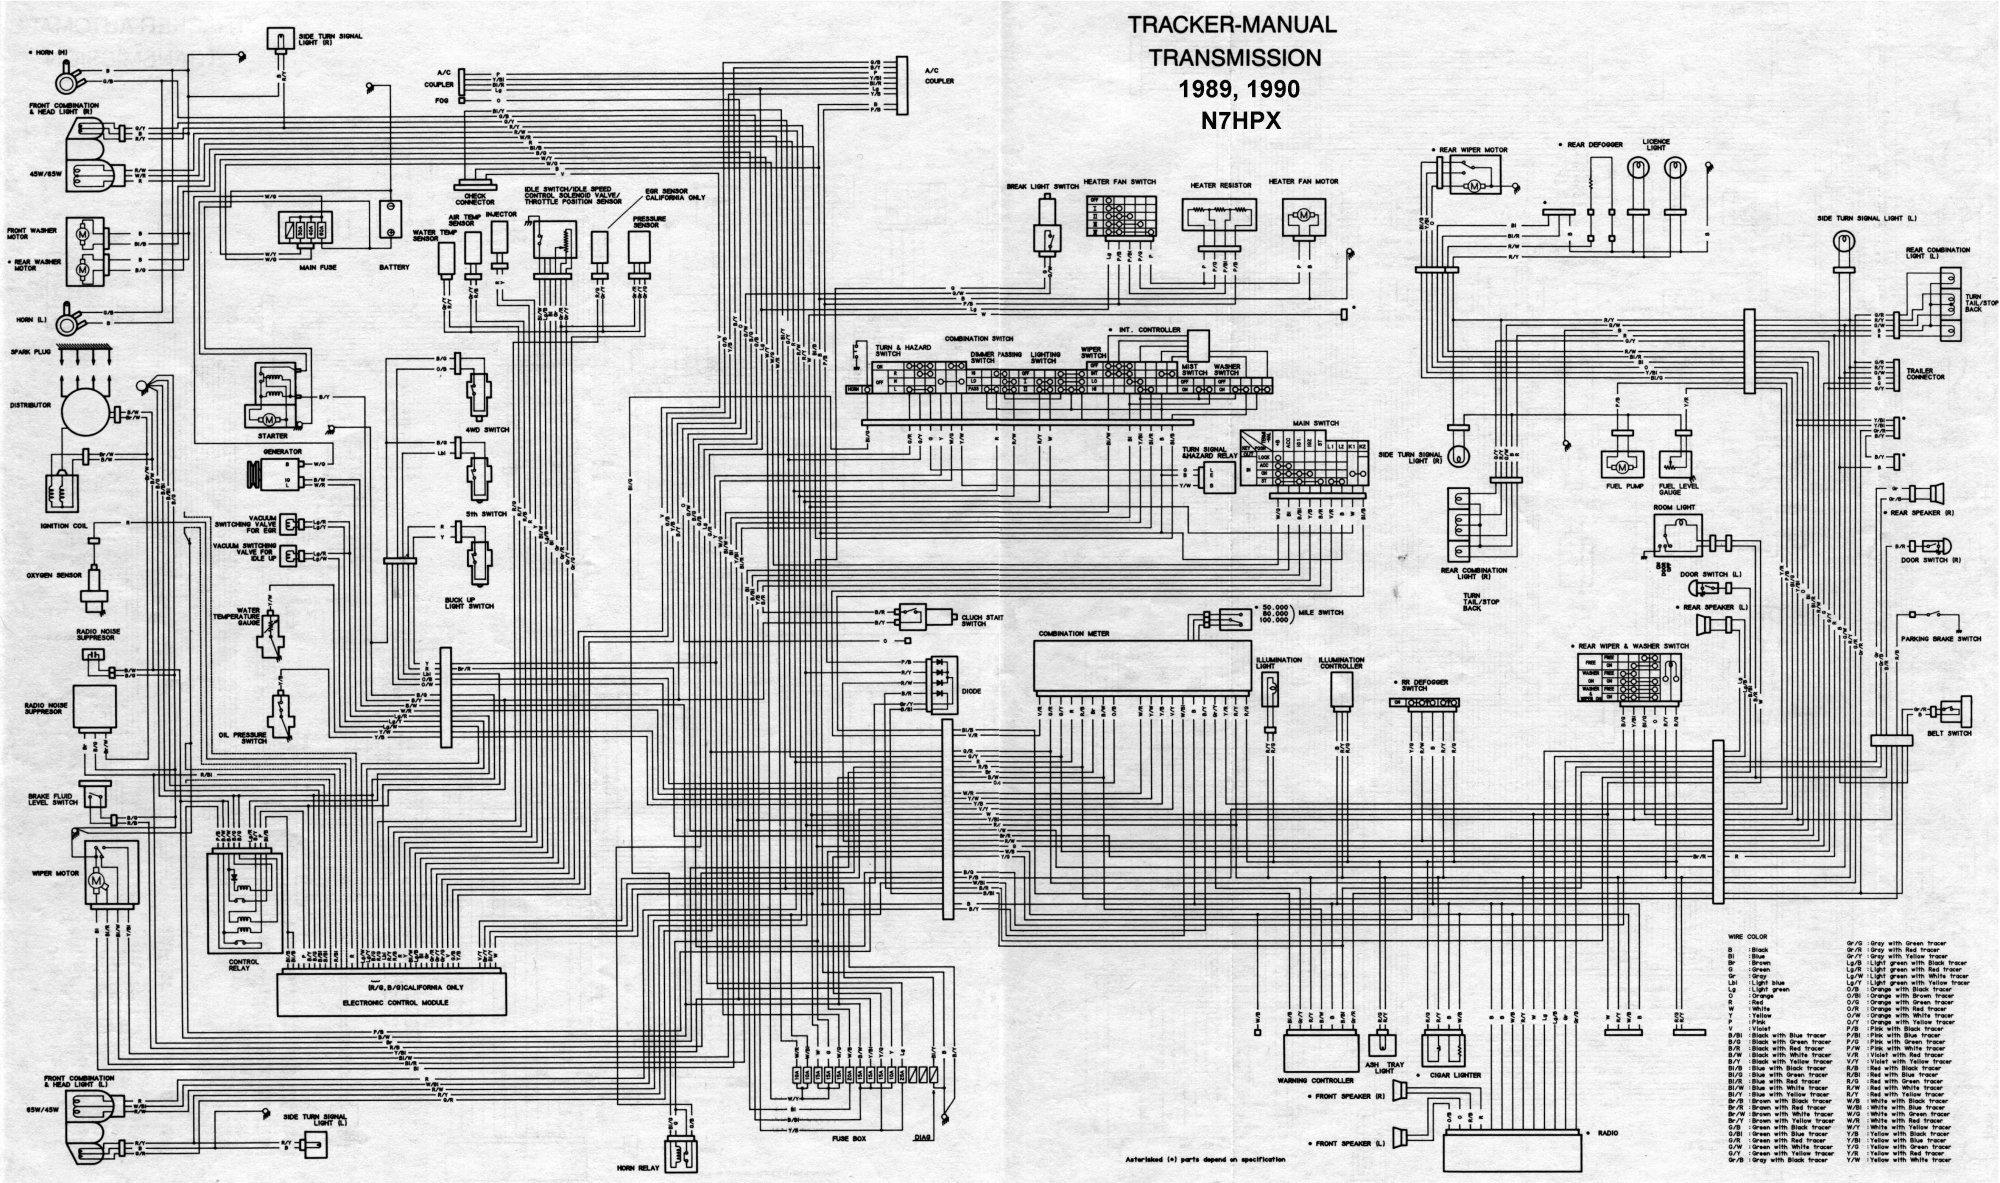 hight resolution of 2005 suzuki xl7 wiring diagram wiring library rh 36 bloxhuette de golf cart g16a parts 1999 yamaha g16a wiring diagram